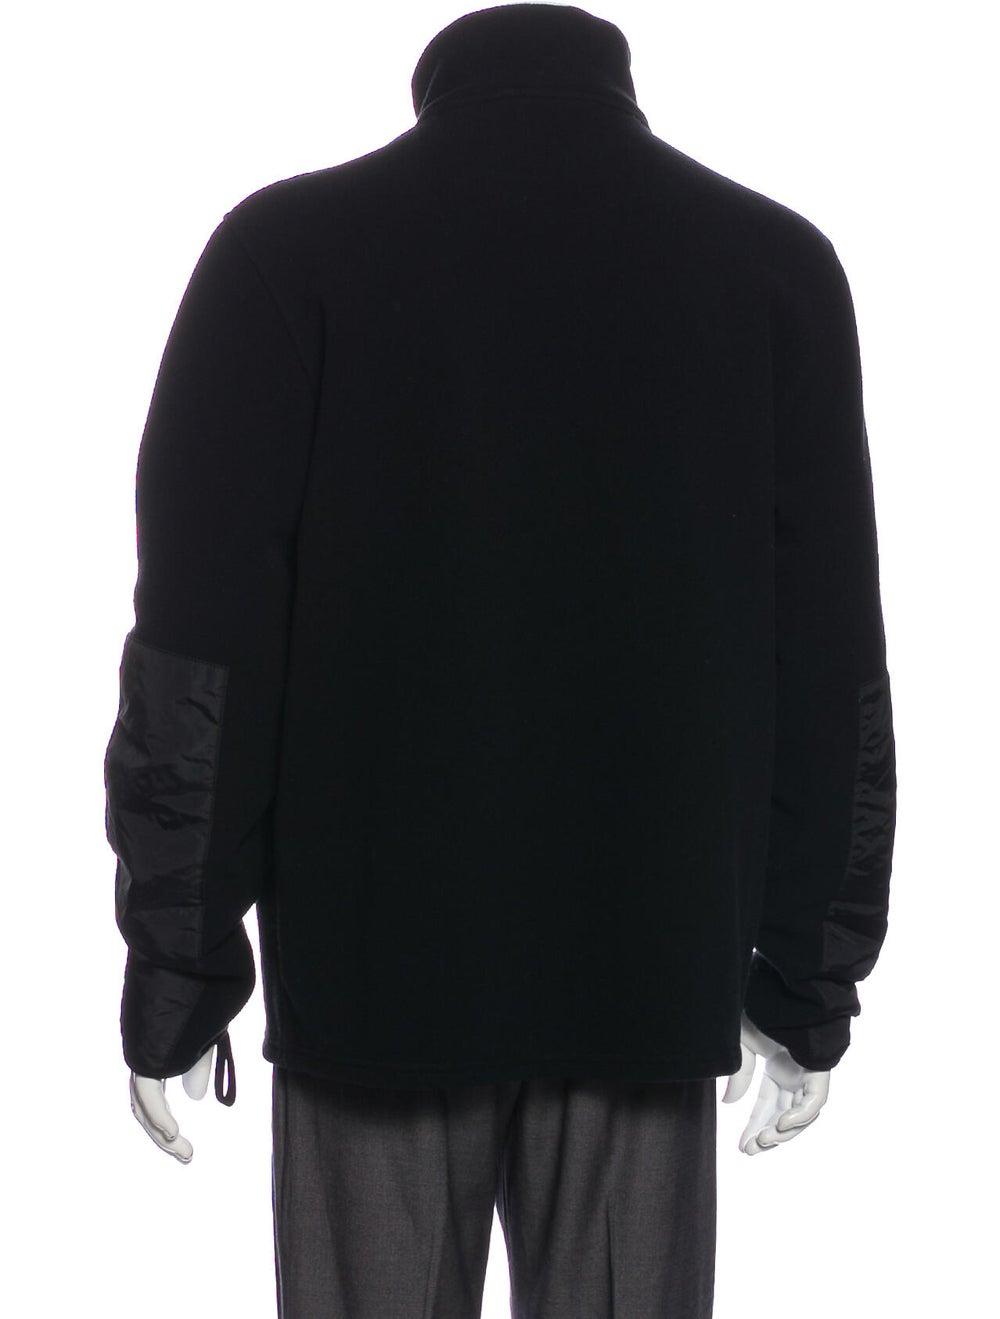 Prada Sport Jacket Black - image 3